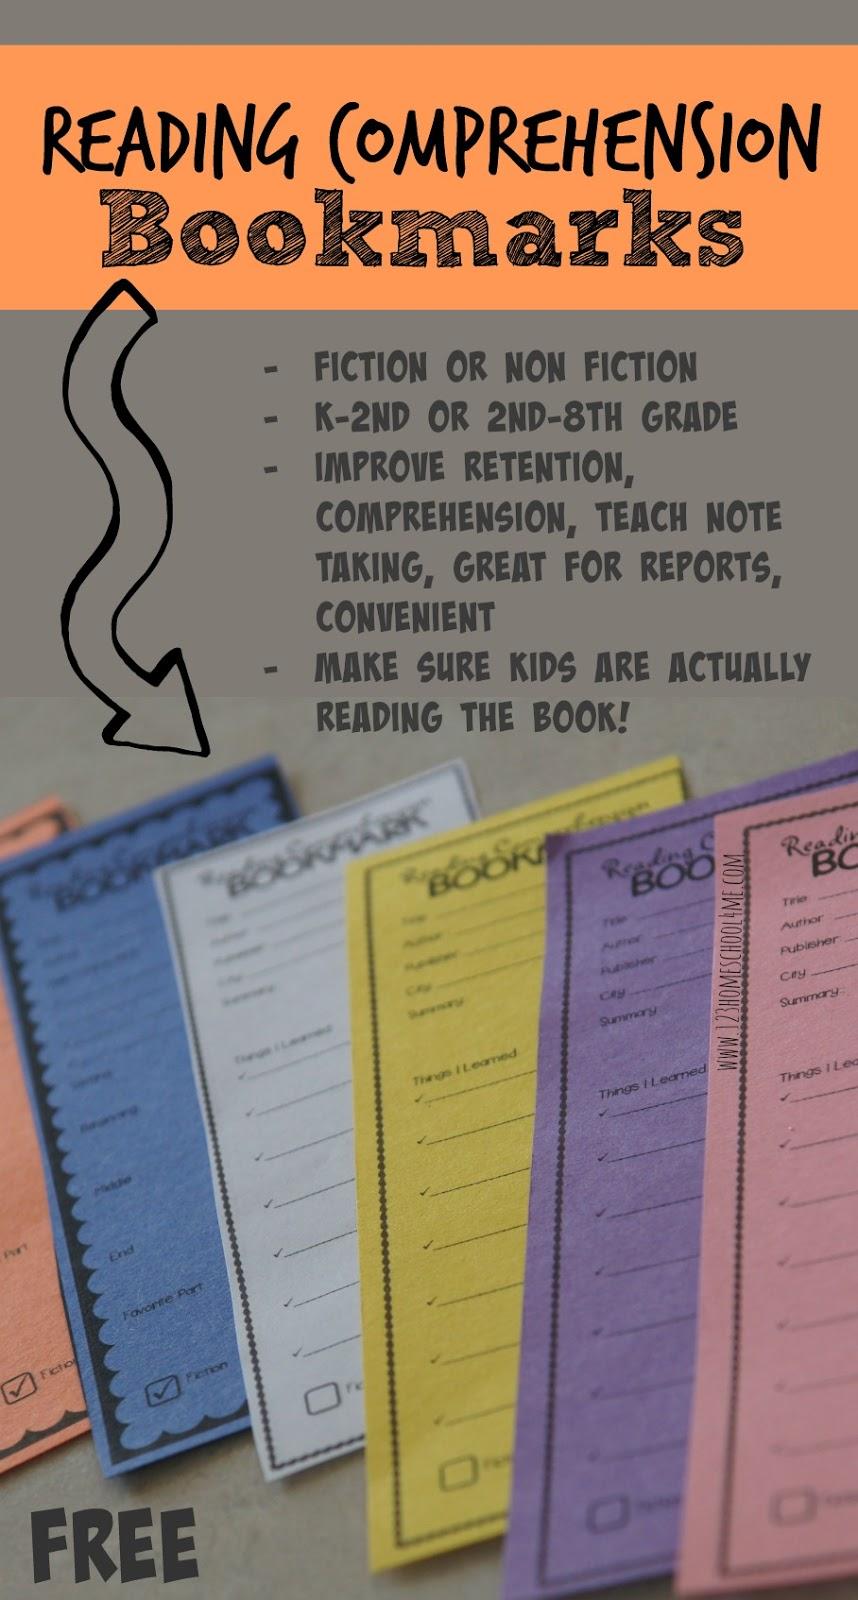 8th grade reading comprehension worksheets free